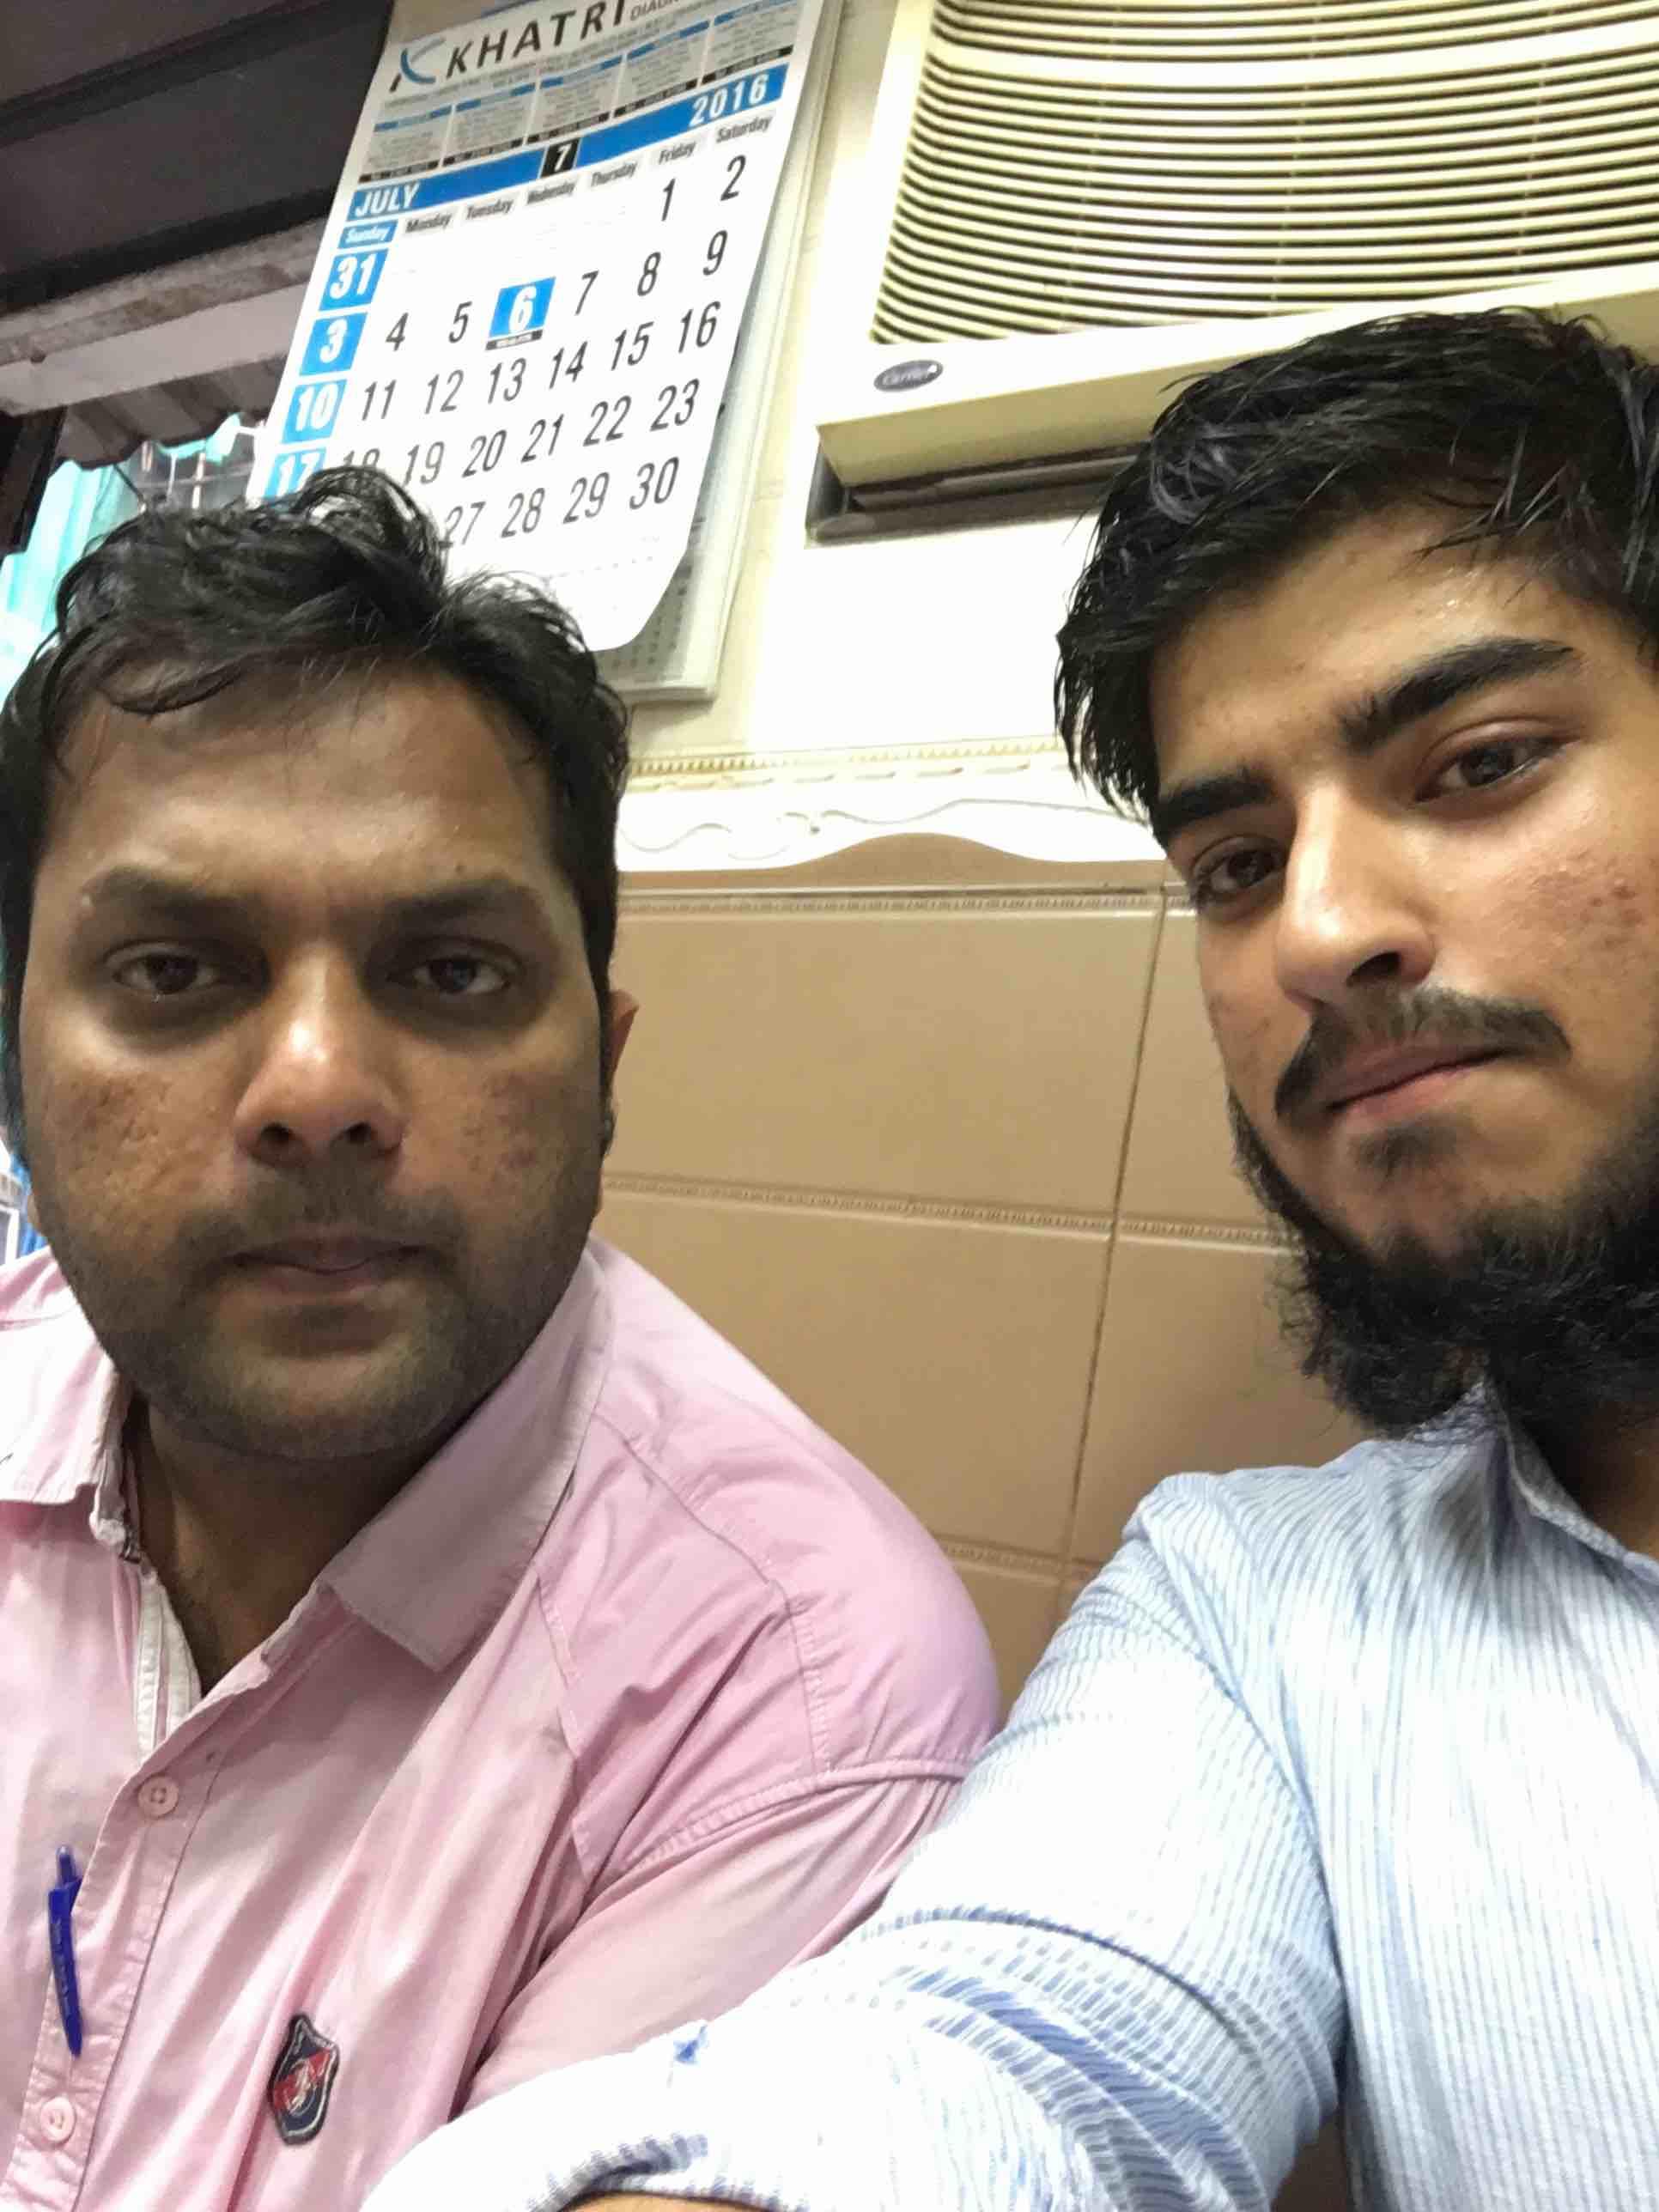 Khatri Diagnostic Center